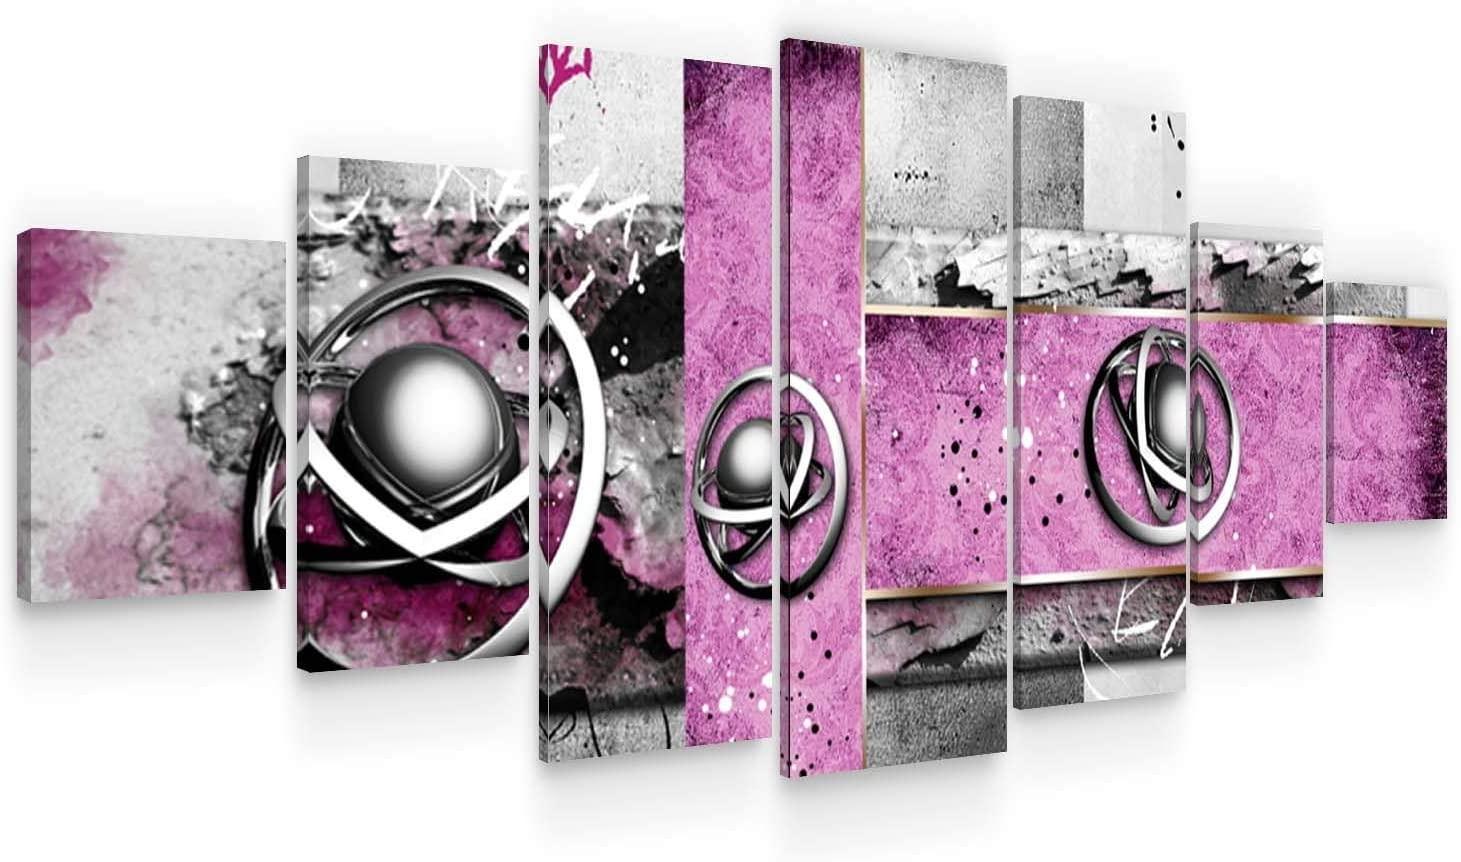 Startonight Large Canvas Wall Art - Abstract Decoration Purple Spirals - Huge Framed Modern Set of 7 Panels 40